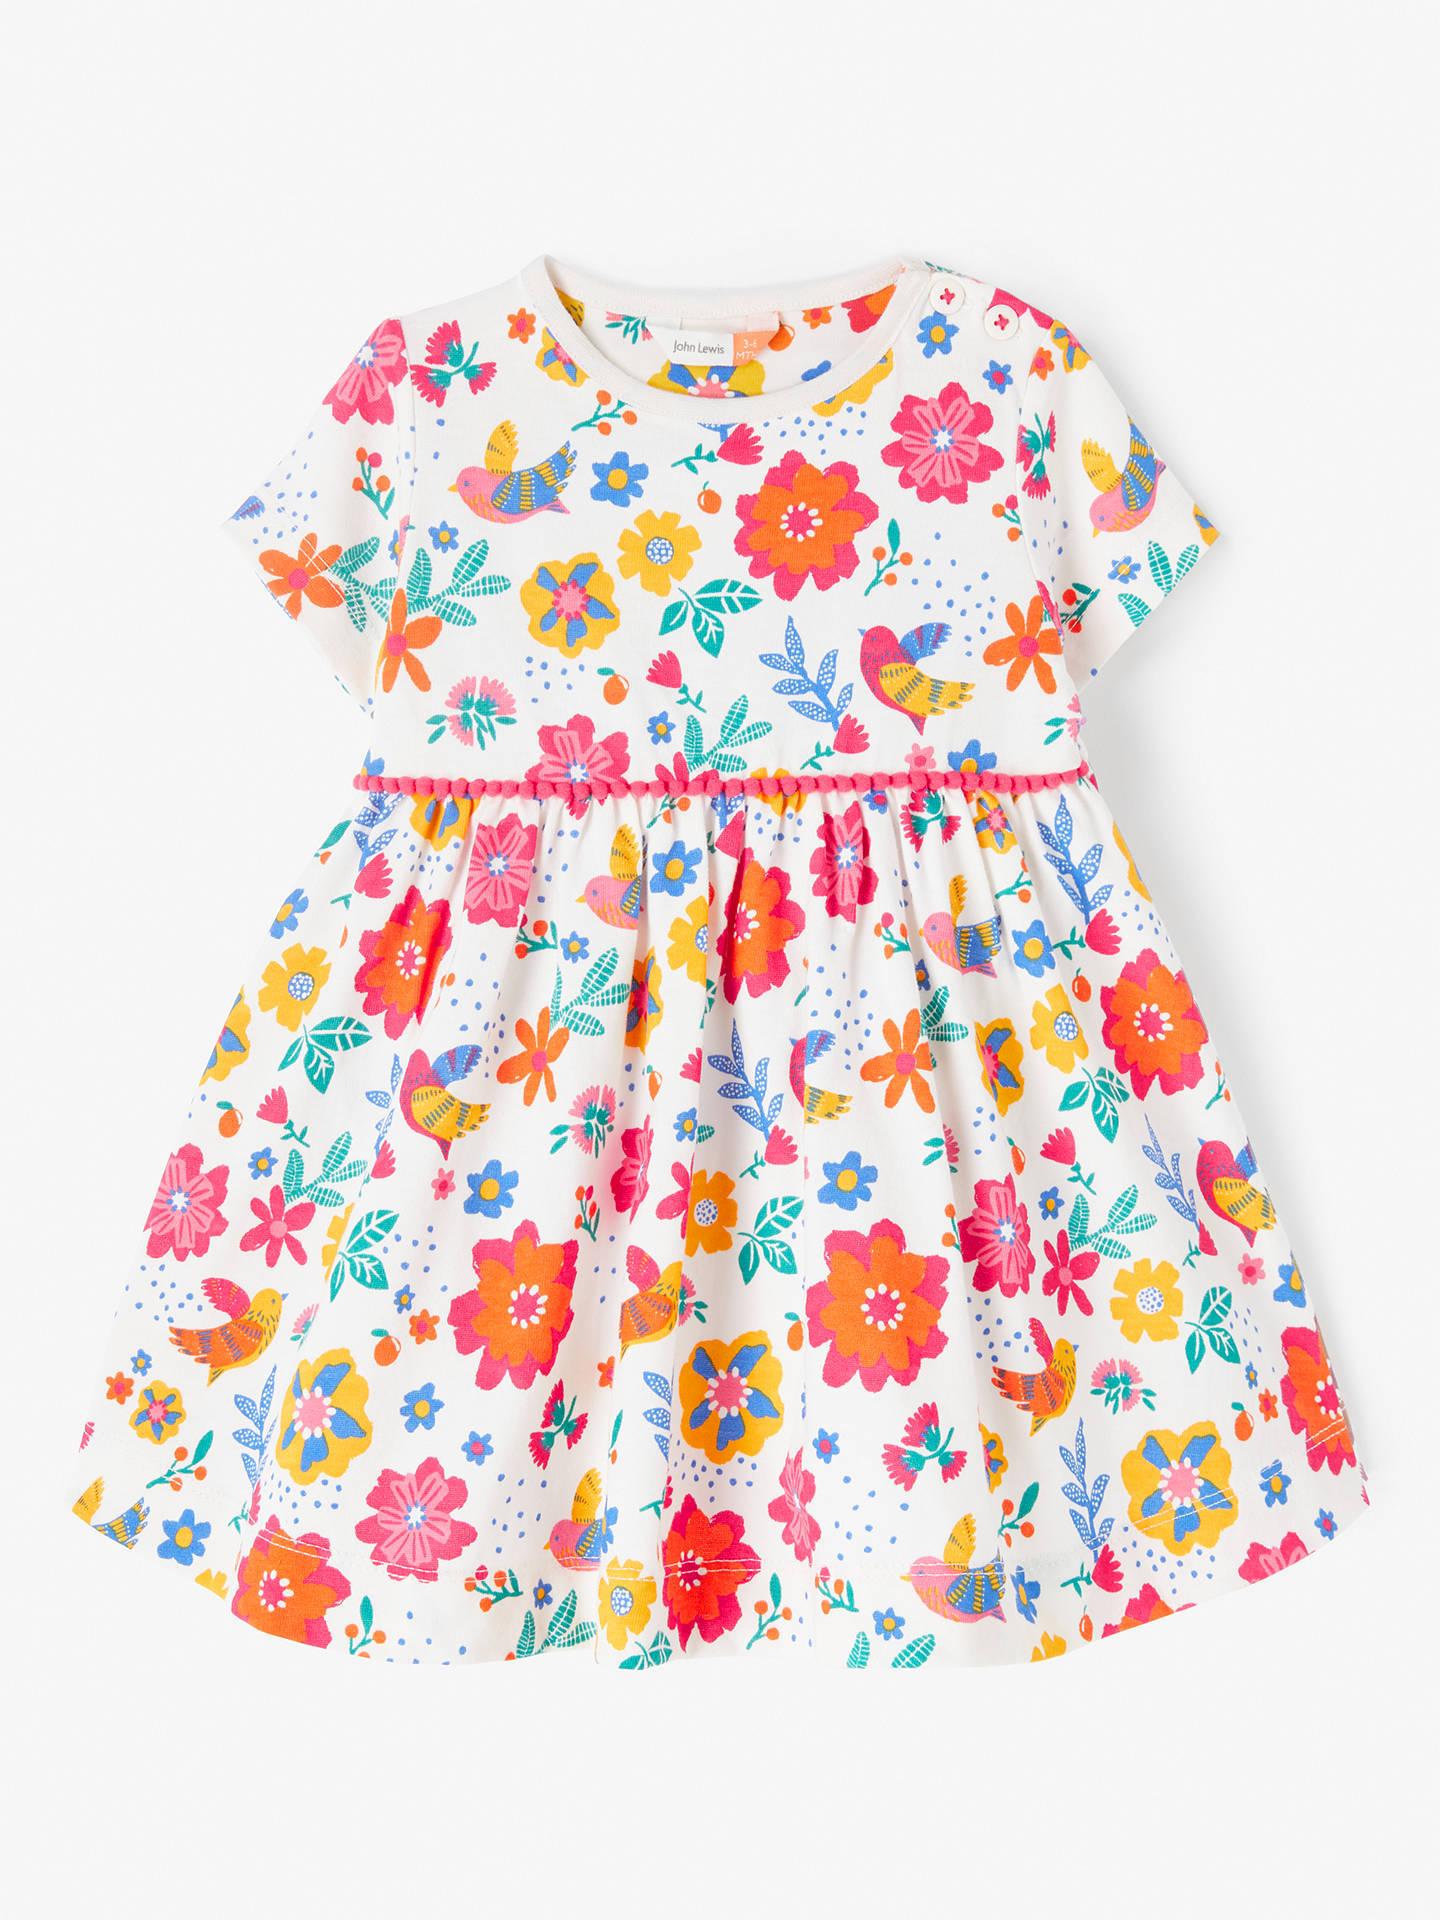 95becf6c2 Buy John Lewis & Partners Baby Floral Jersey Dress, Multi, 6-9 months ...